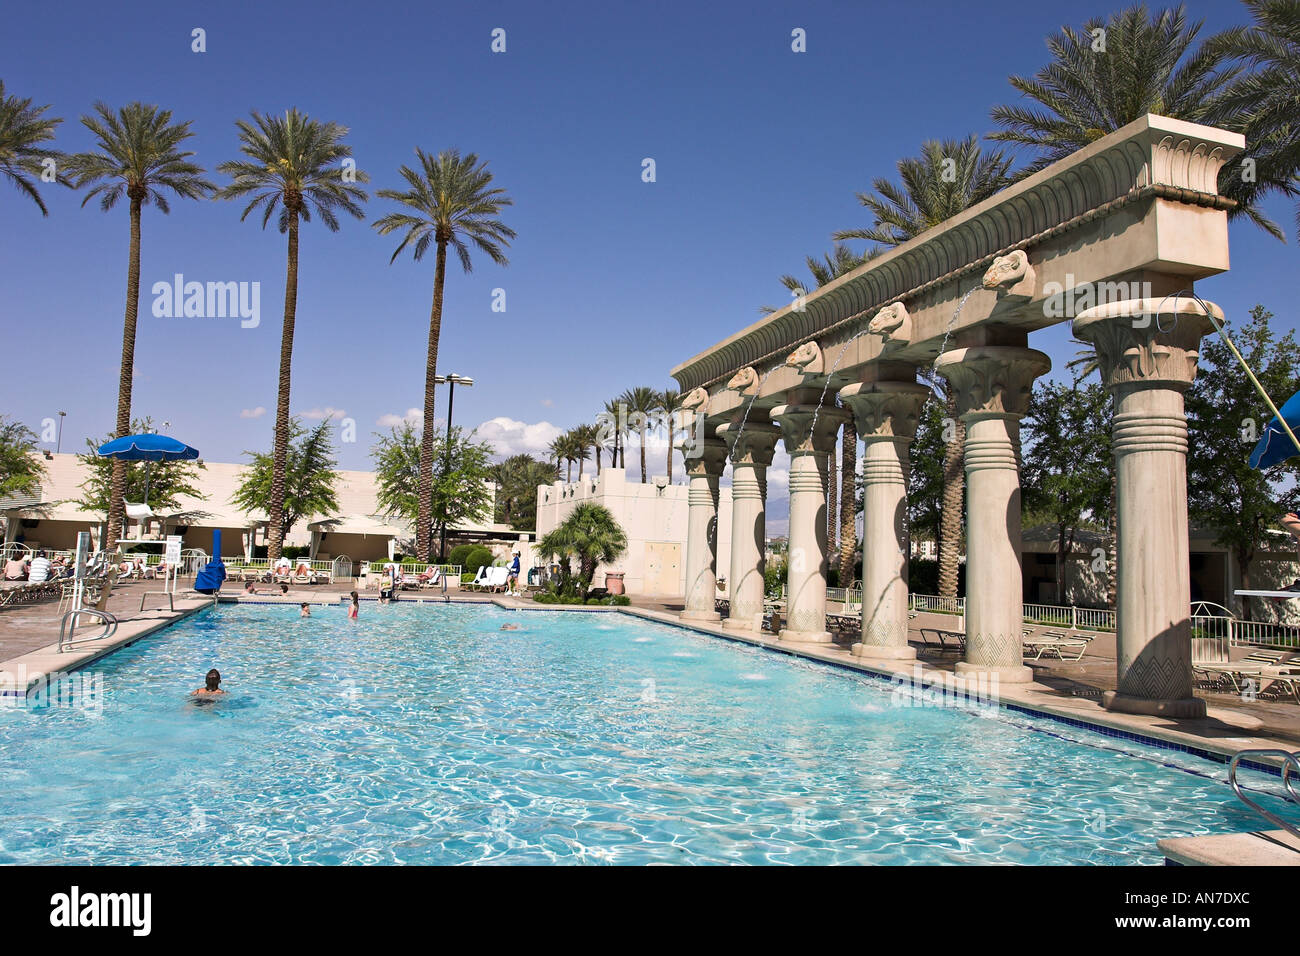 Luxor hotel pool stock photos luxor hotel pool stock - Luxor hotel las vegas swimming pool ...